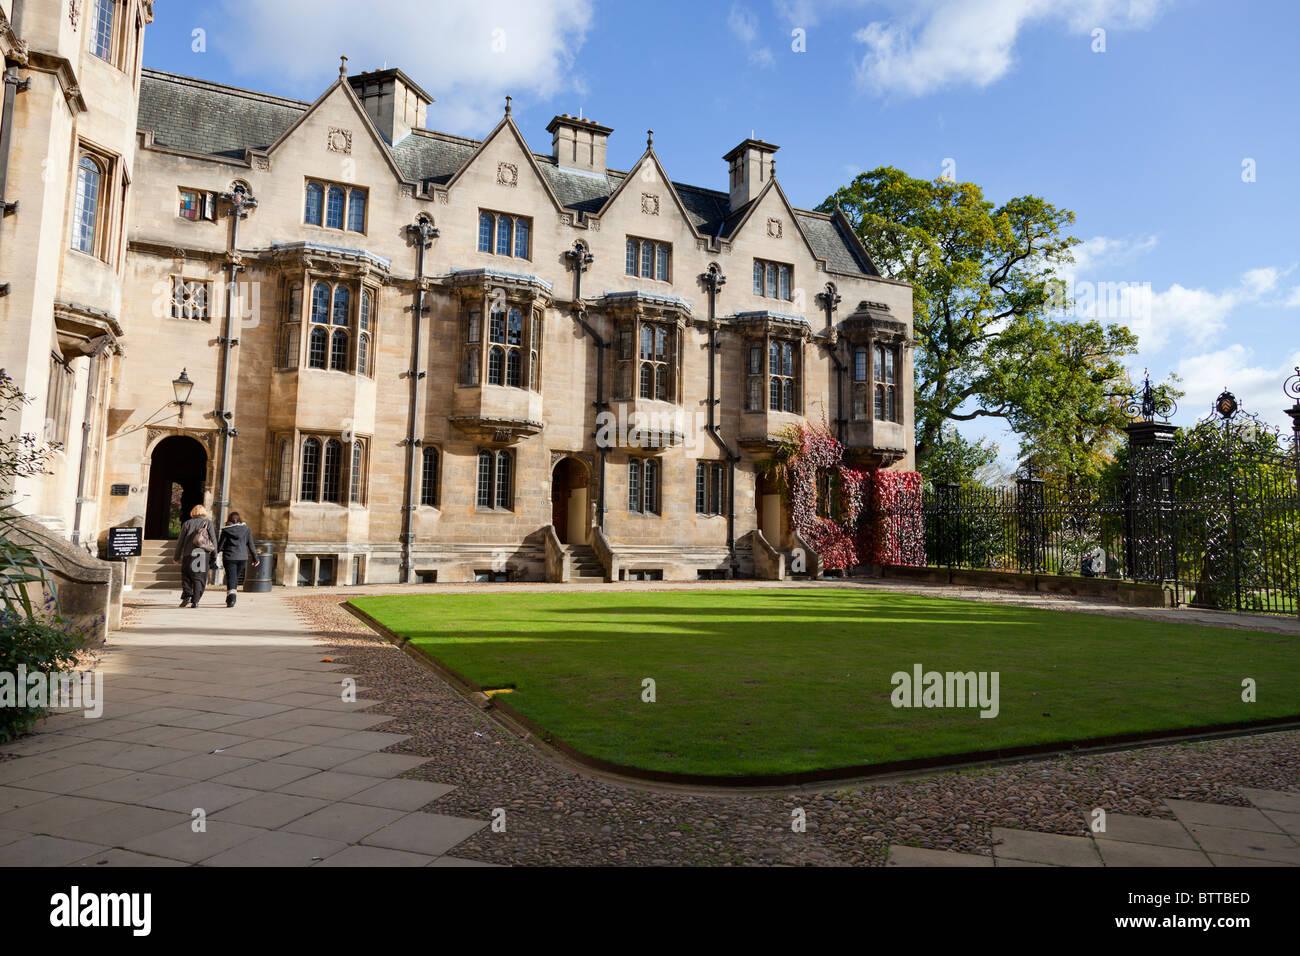 Fellows' Quadrangle, Merton College Oxford - Stock Image